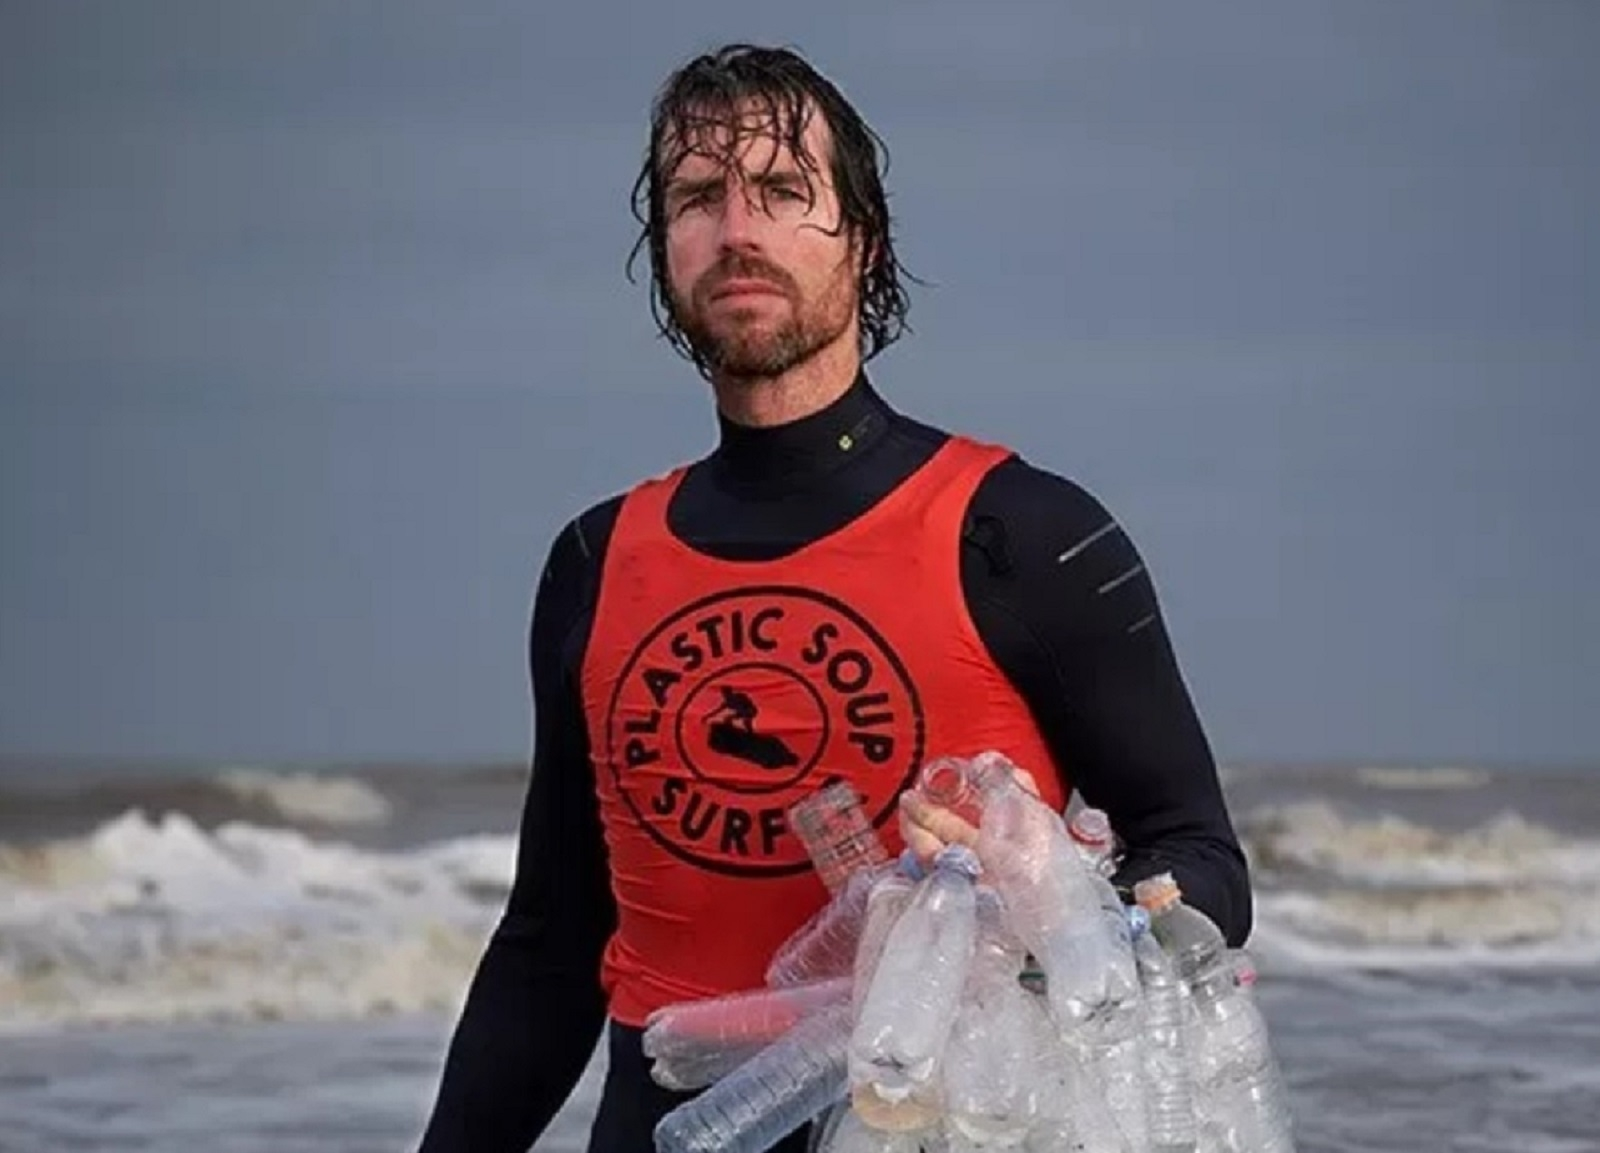 Merijn Tinga, de Plastic Soup Surfer